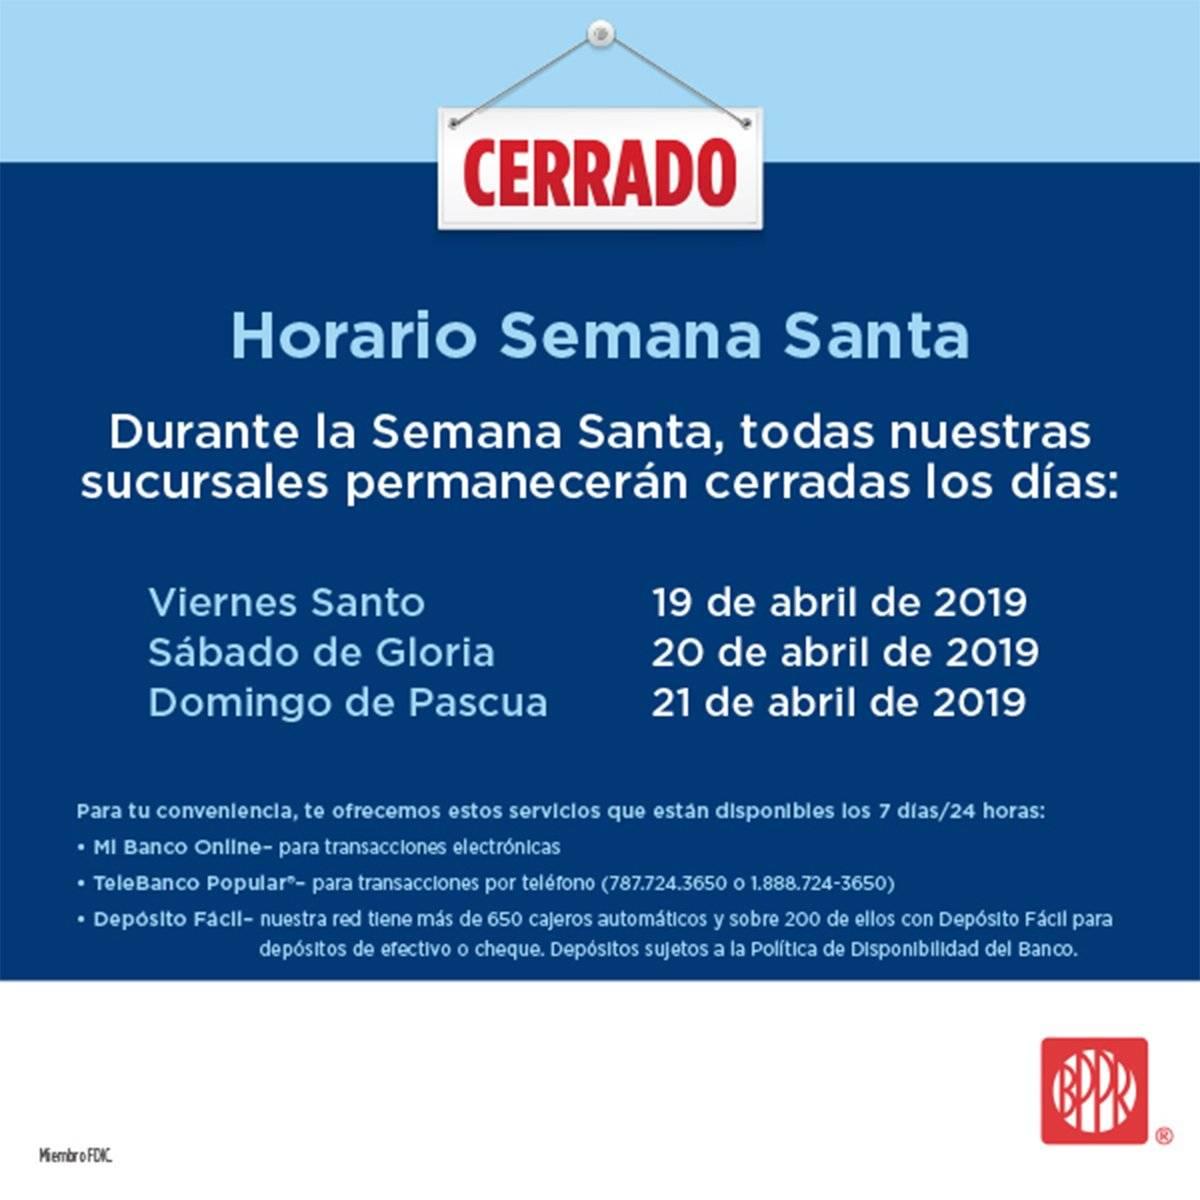 Horario Semana Santa Banco Popular